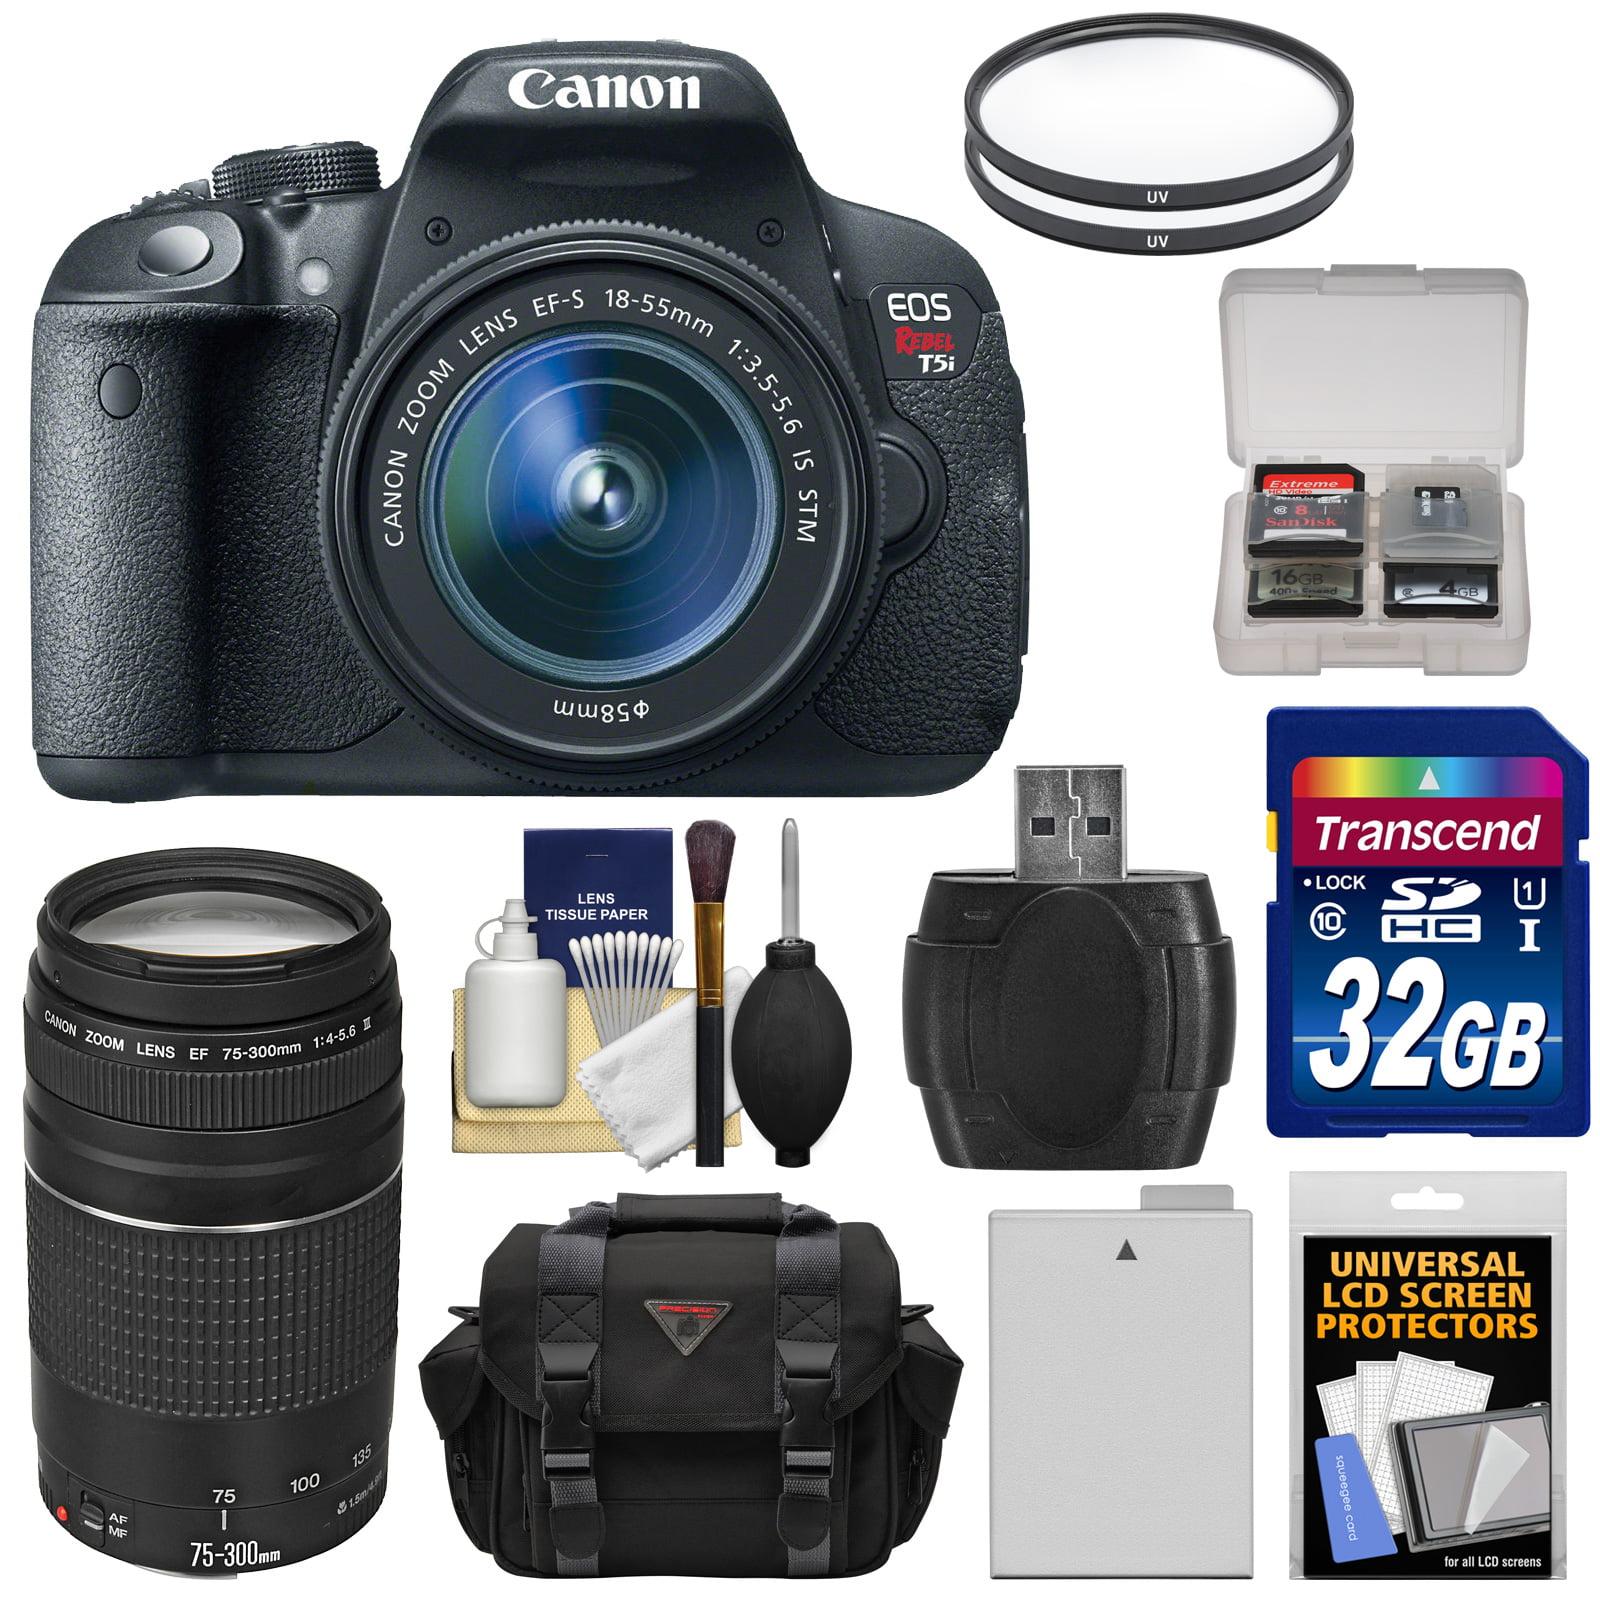 Canon EOS Rebel T5i Digital SLR Camera & EF-S 18-55mm IS